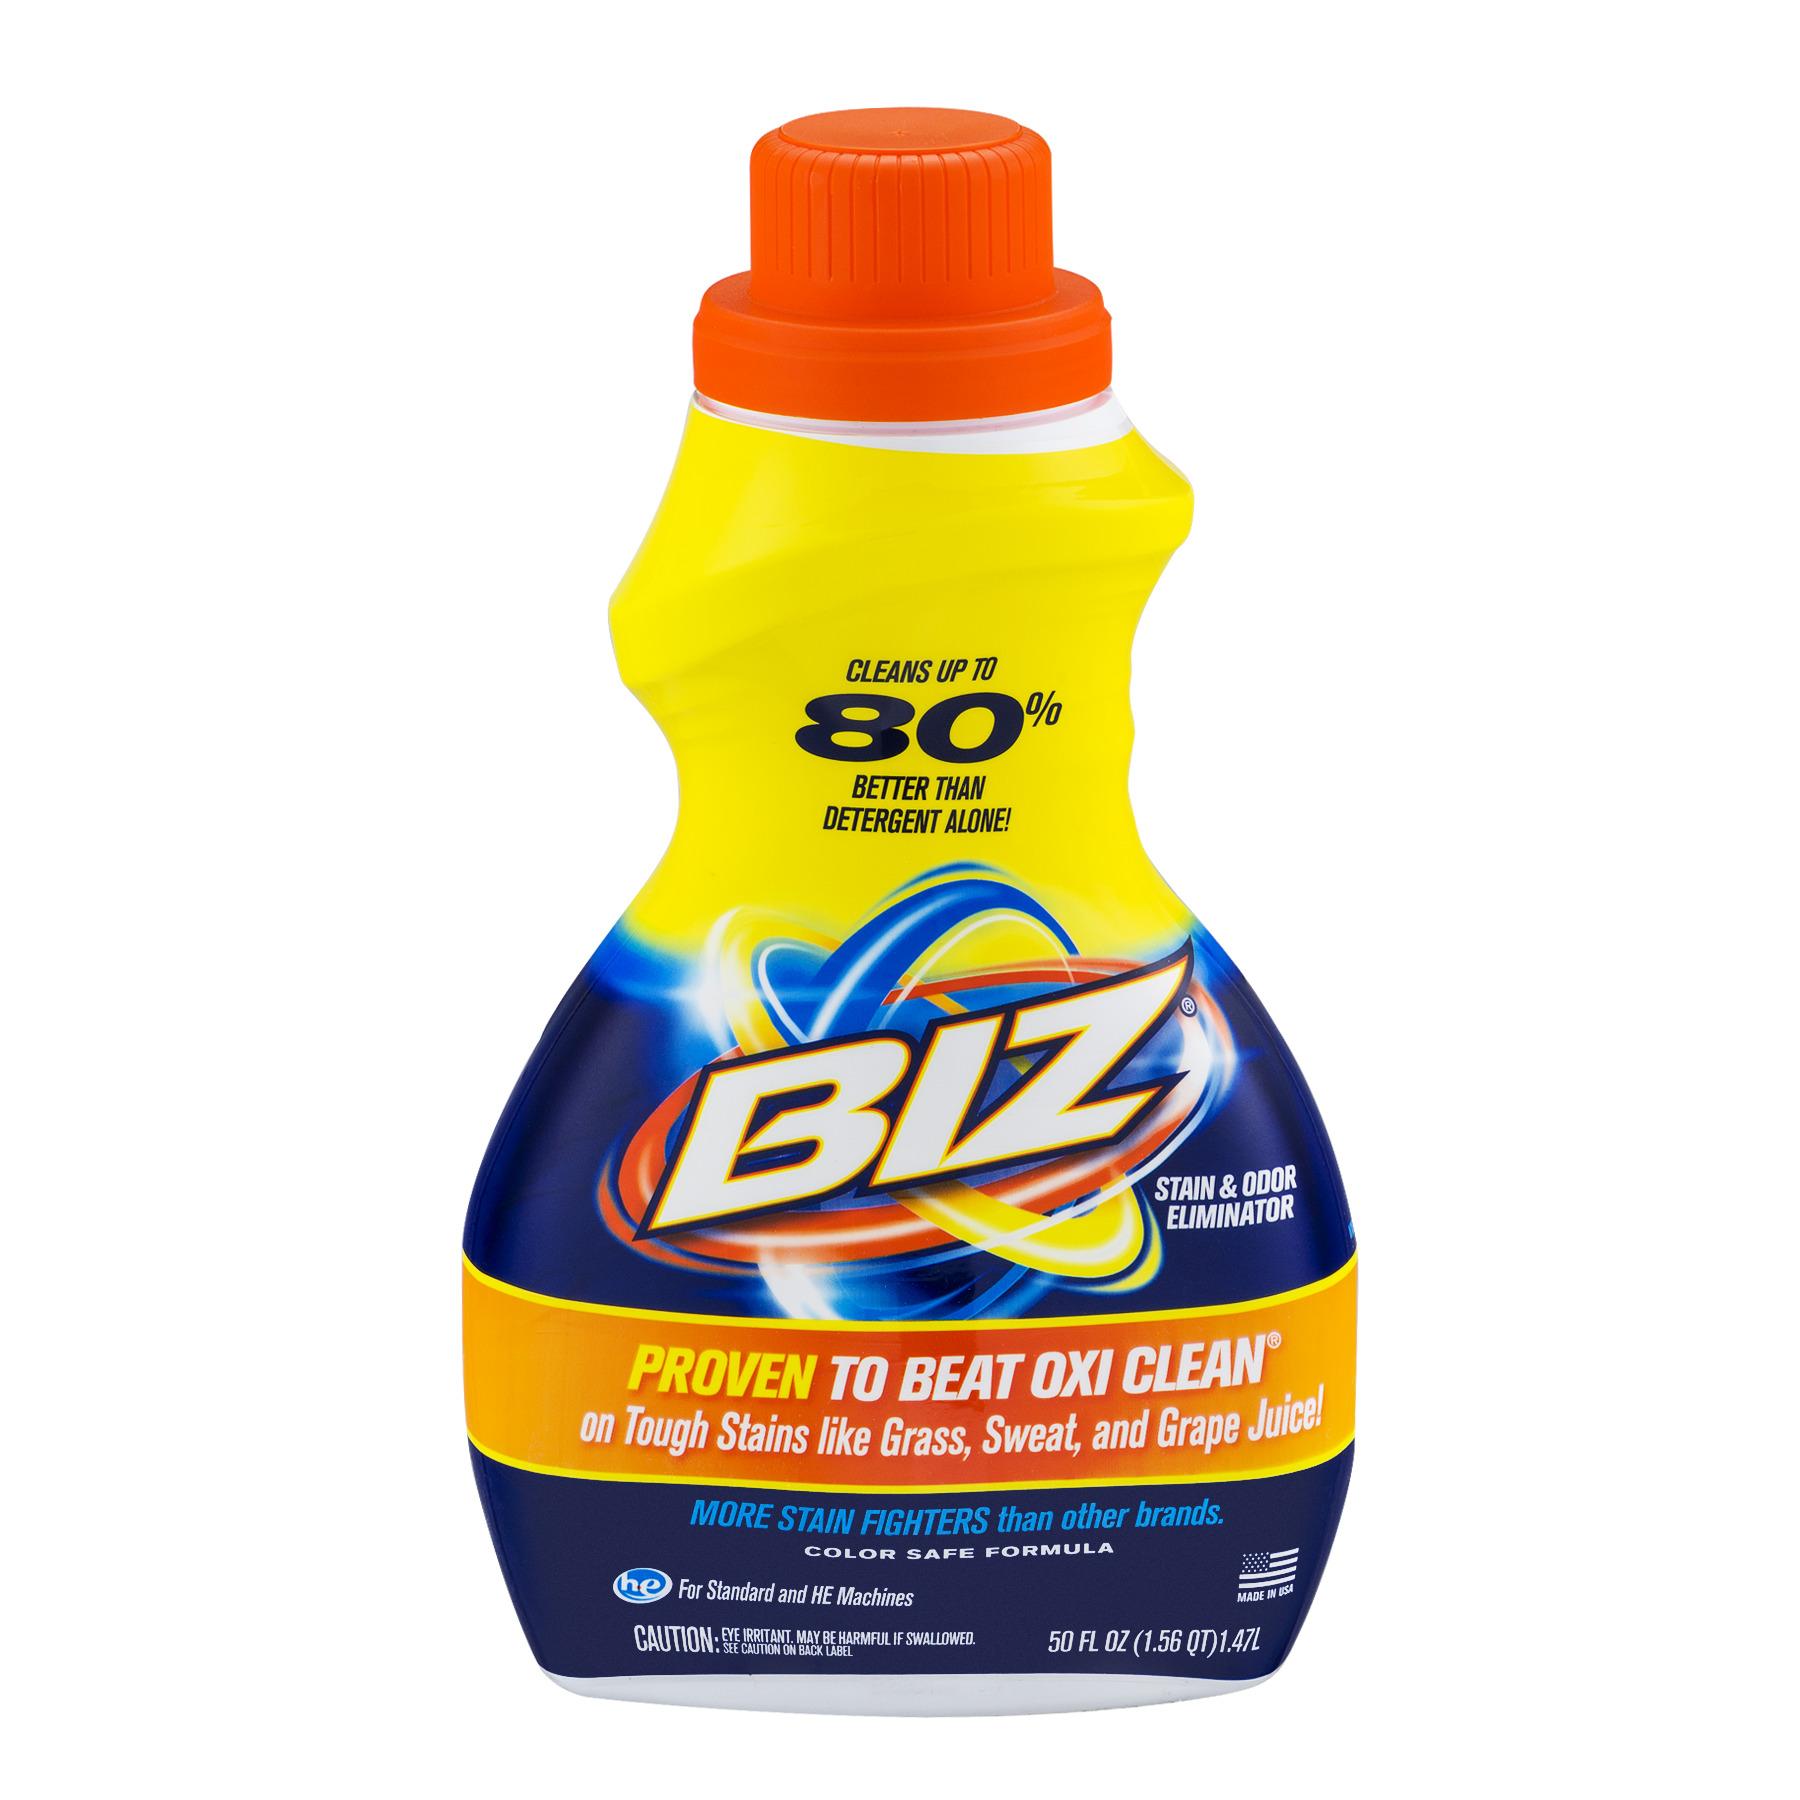 Biz Stain & Odor Eliminator Liquid, 50 fl oz